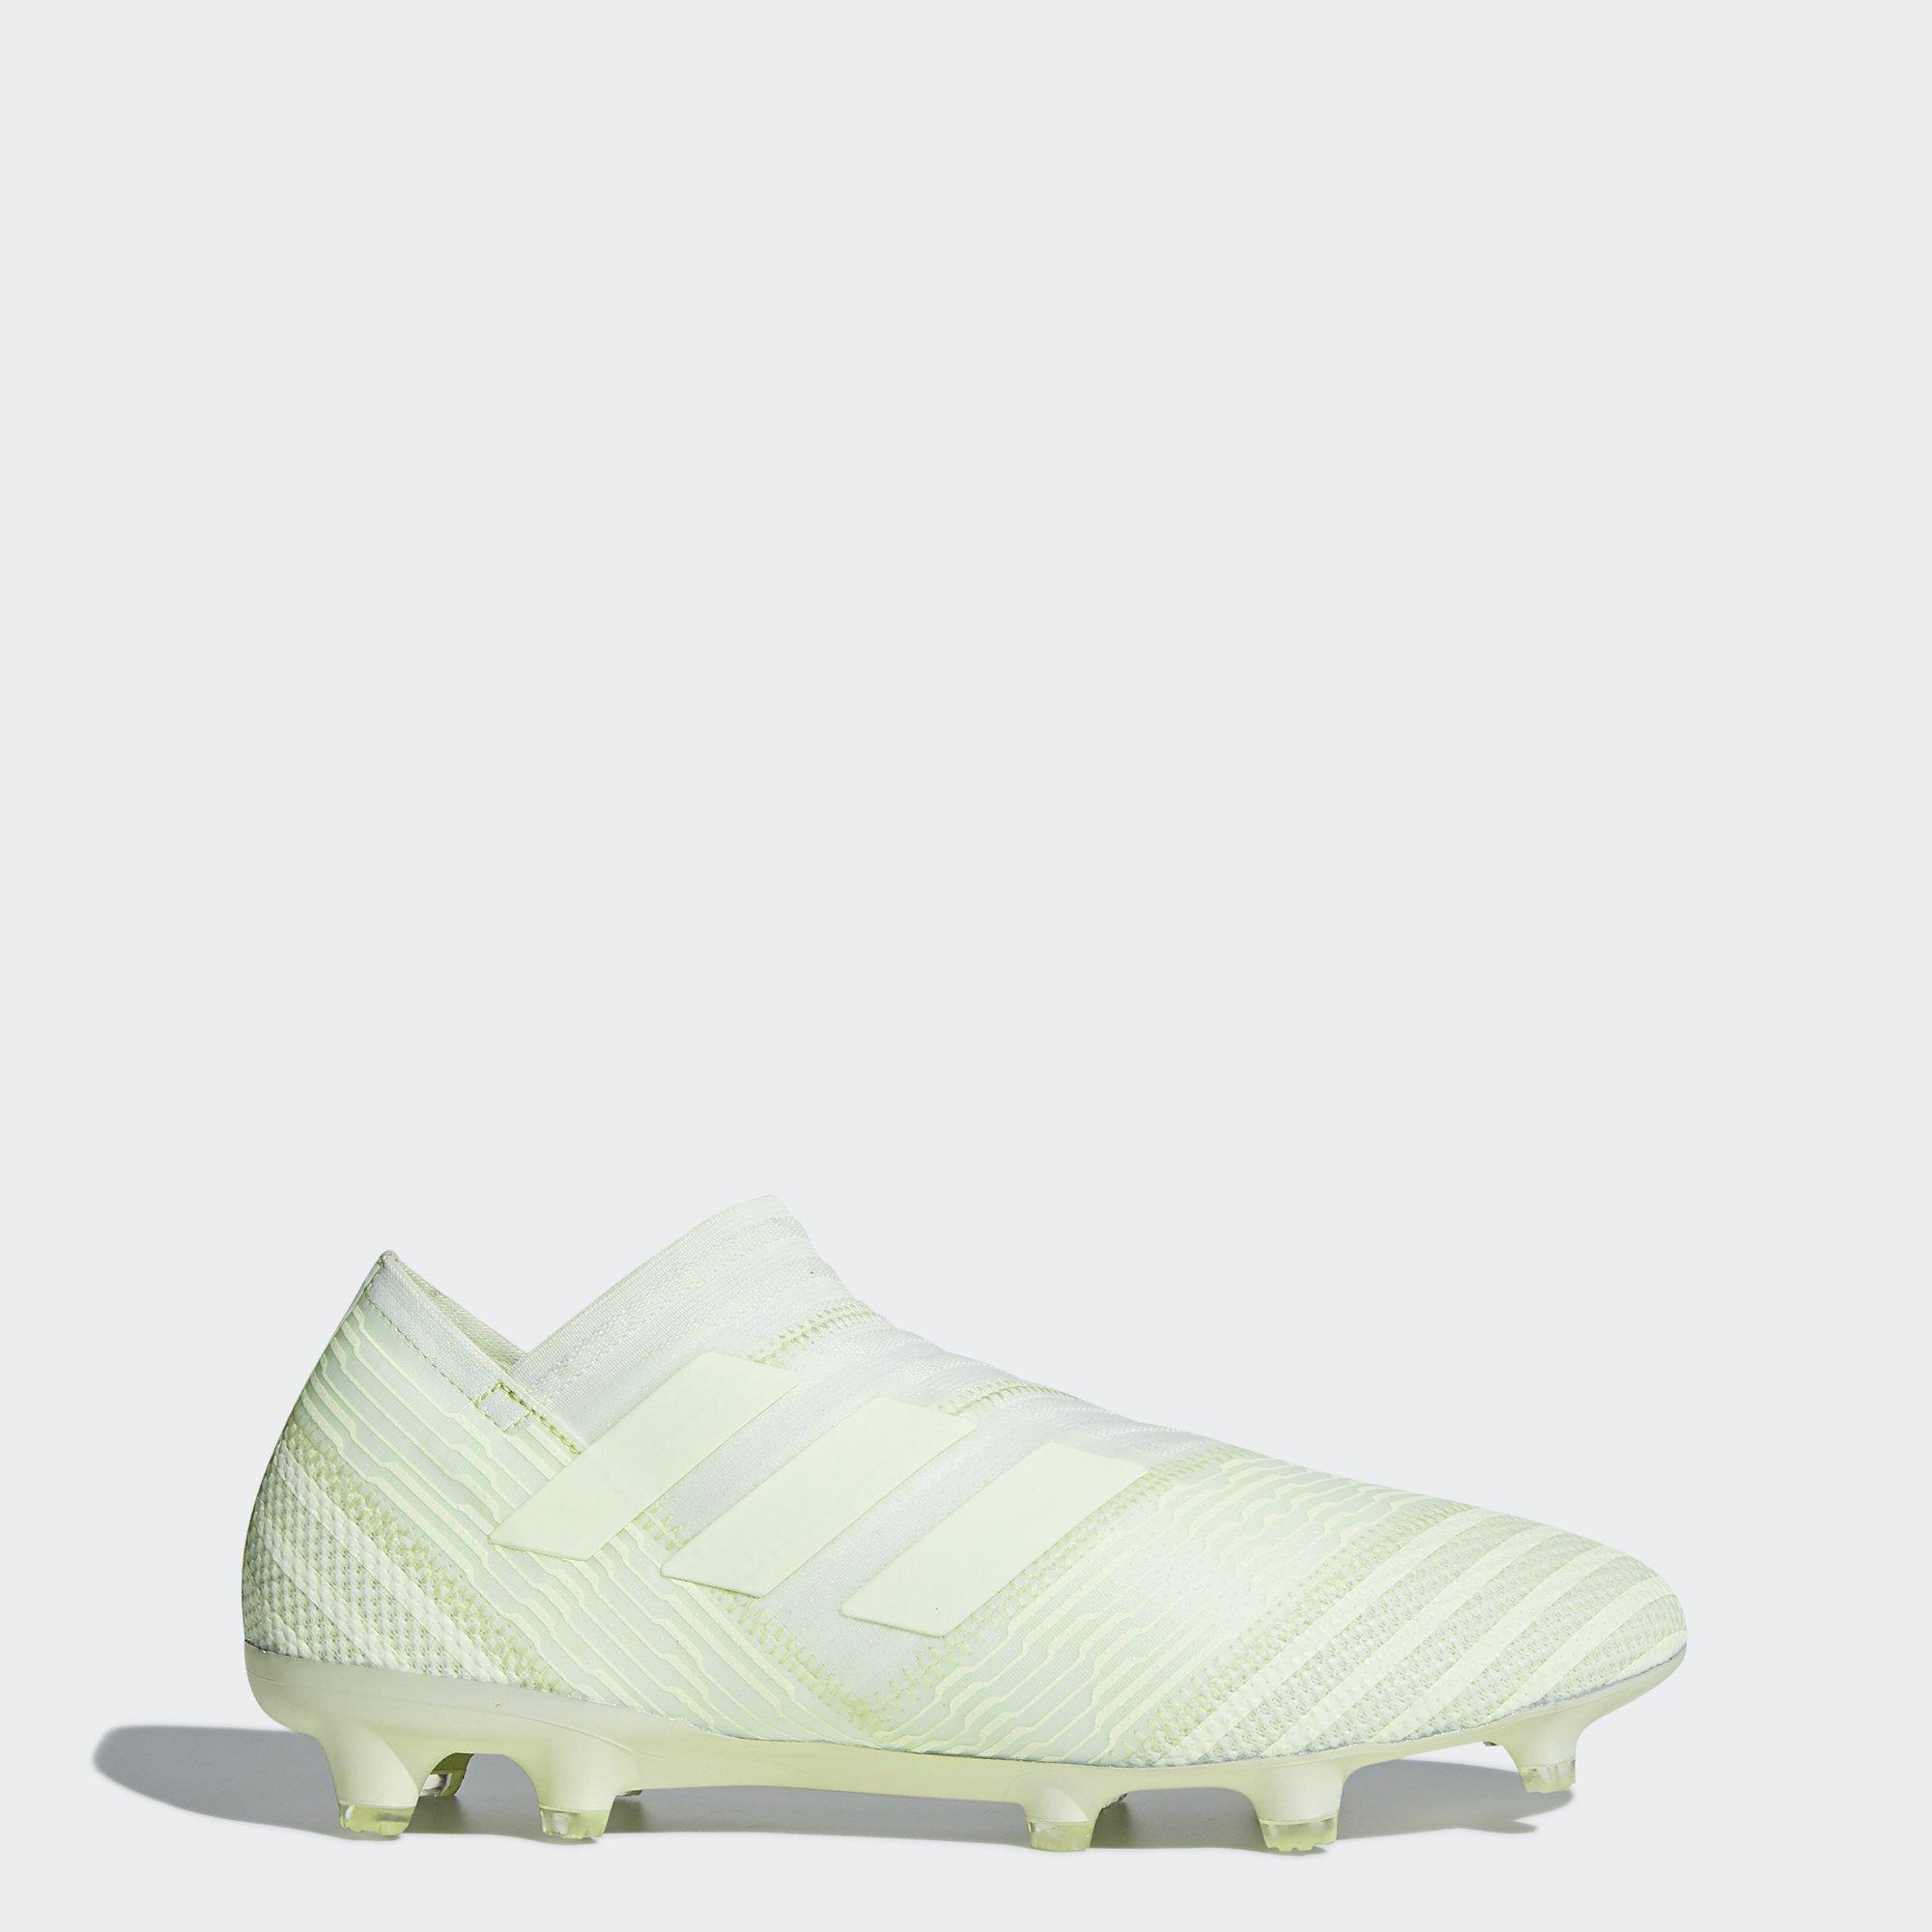 separation shoes 1979d 83d1e adidas  adidas Performance  Buty piłkarskie  Deadlystrike